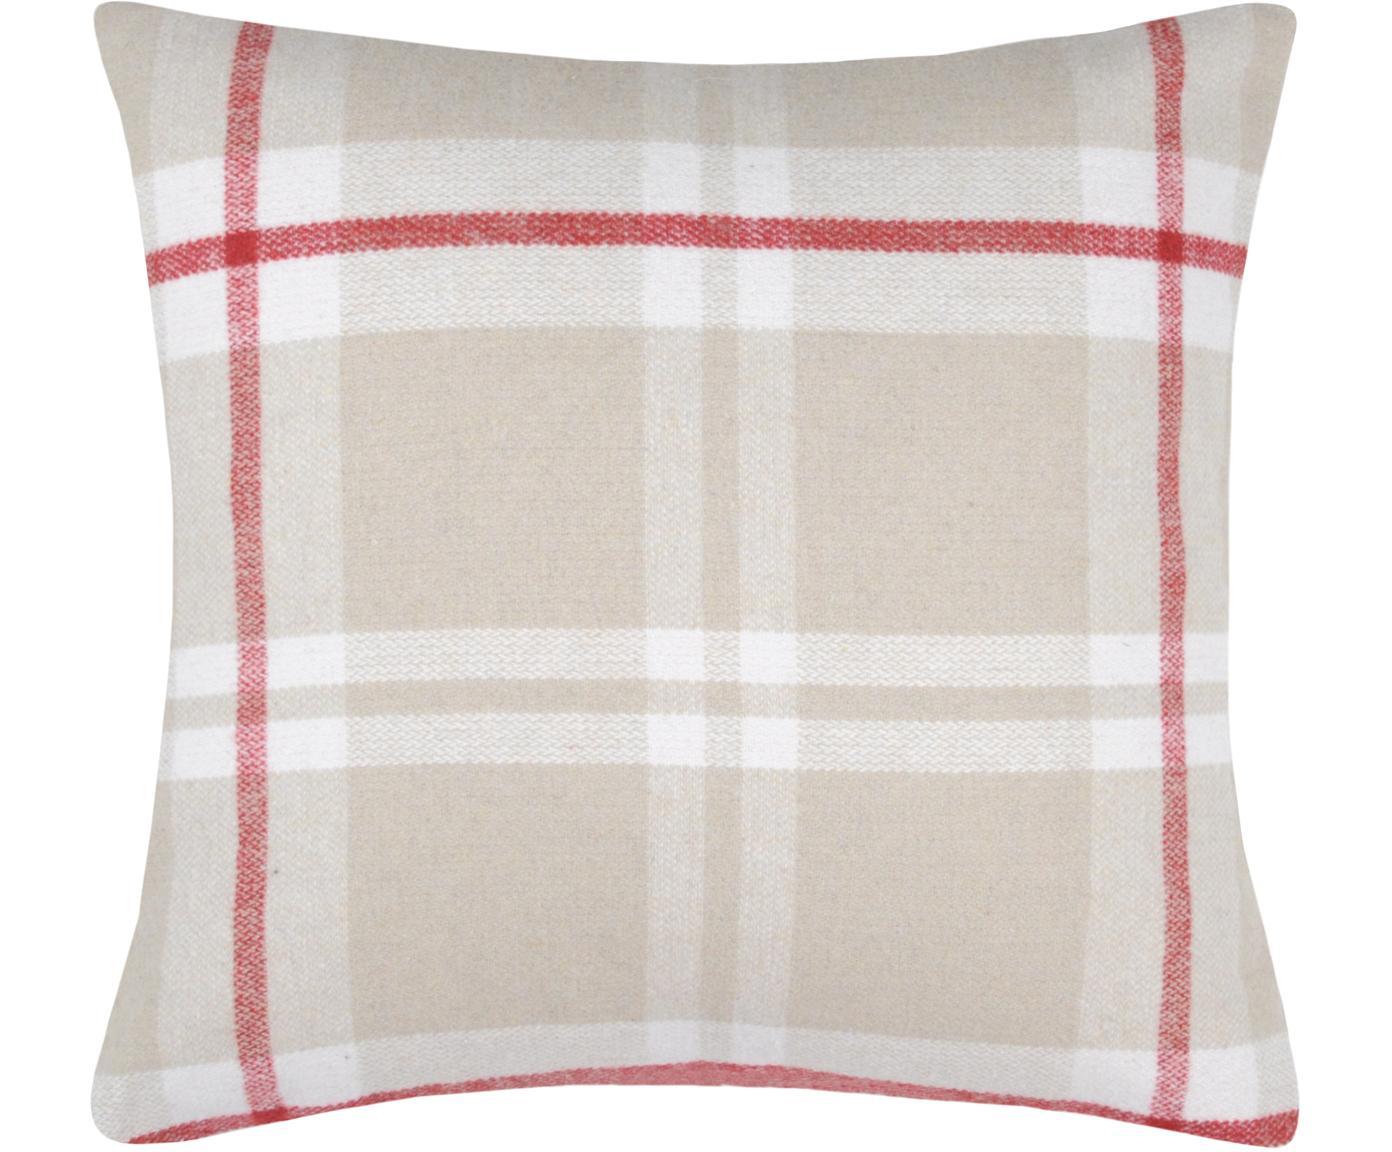 Karierte Kissenhülle Granier, 95% Polyester, 5% Wolle, Beige, Weiss, Rot, 40 x 40 cm